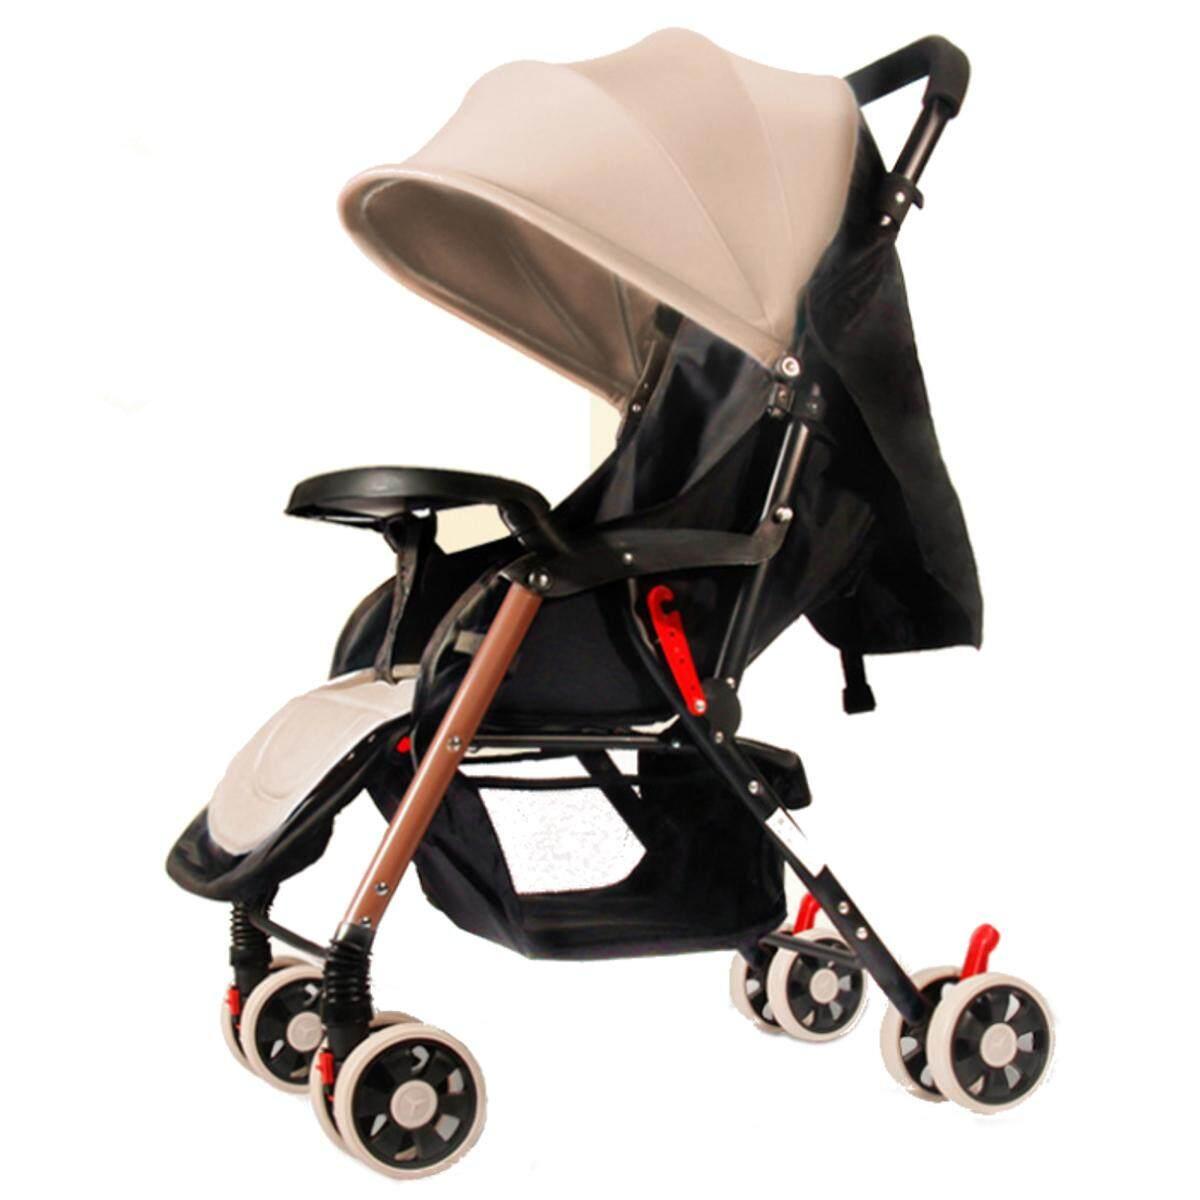 Fly Kids Pram Travel System 3 in 1 Combi Stroller Buggy Baby Child Pushchair